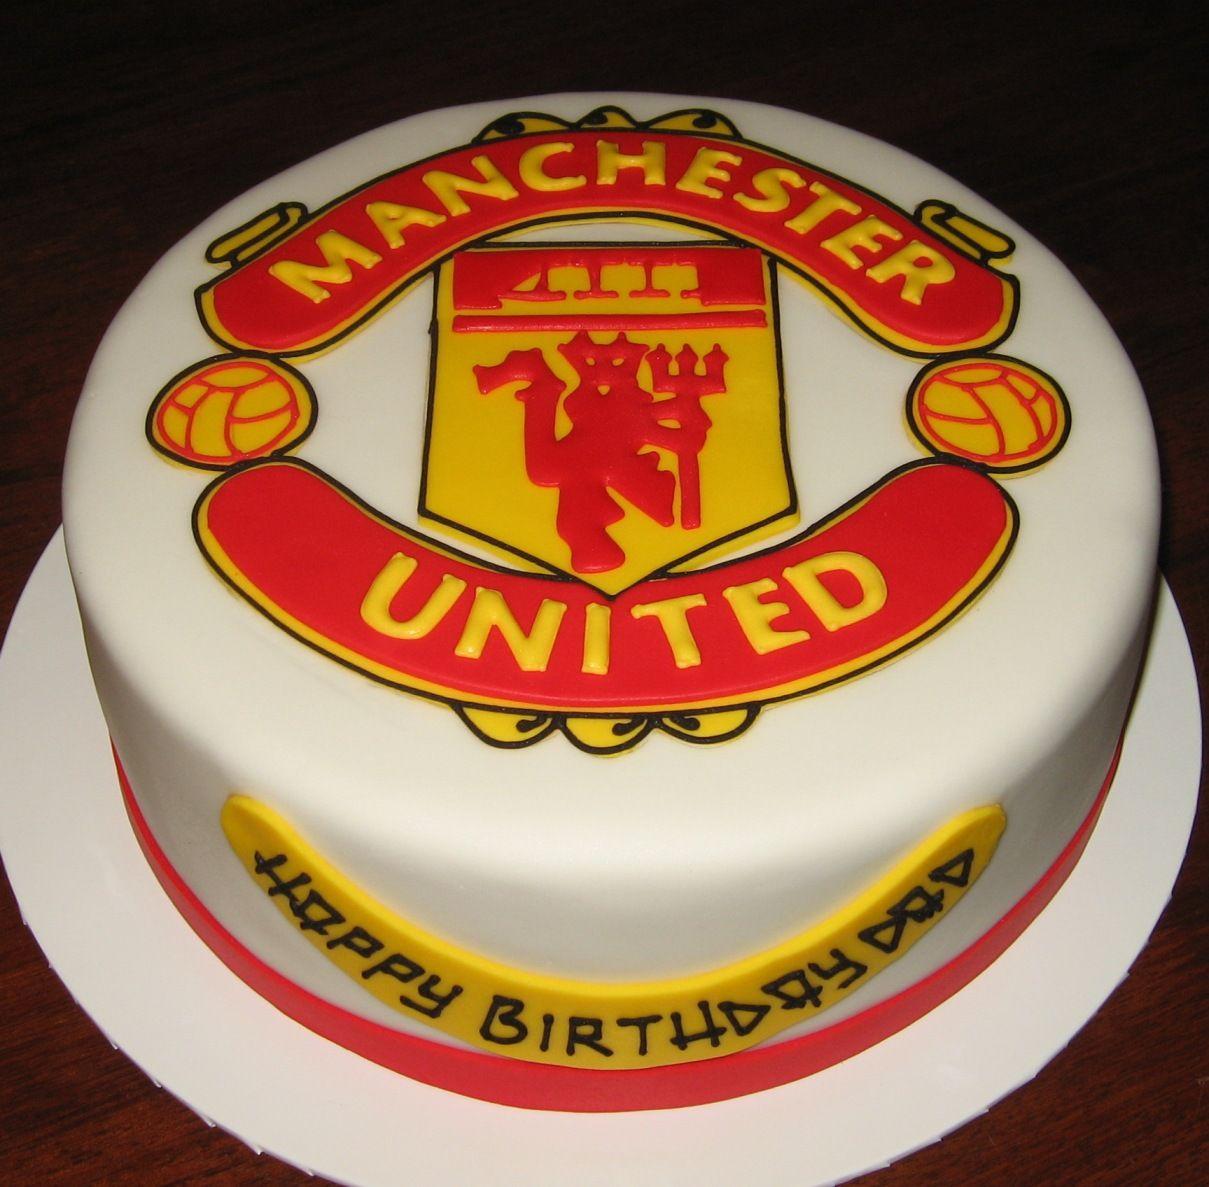 Terrific Manchester United Cake Google Search Manchester United Cake Birthday Cards Printable Nowaargucafe Filternl